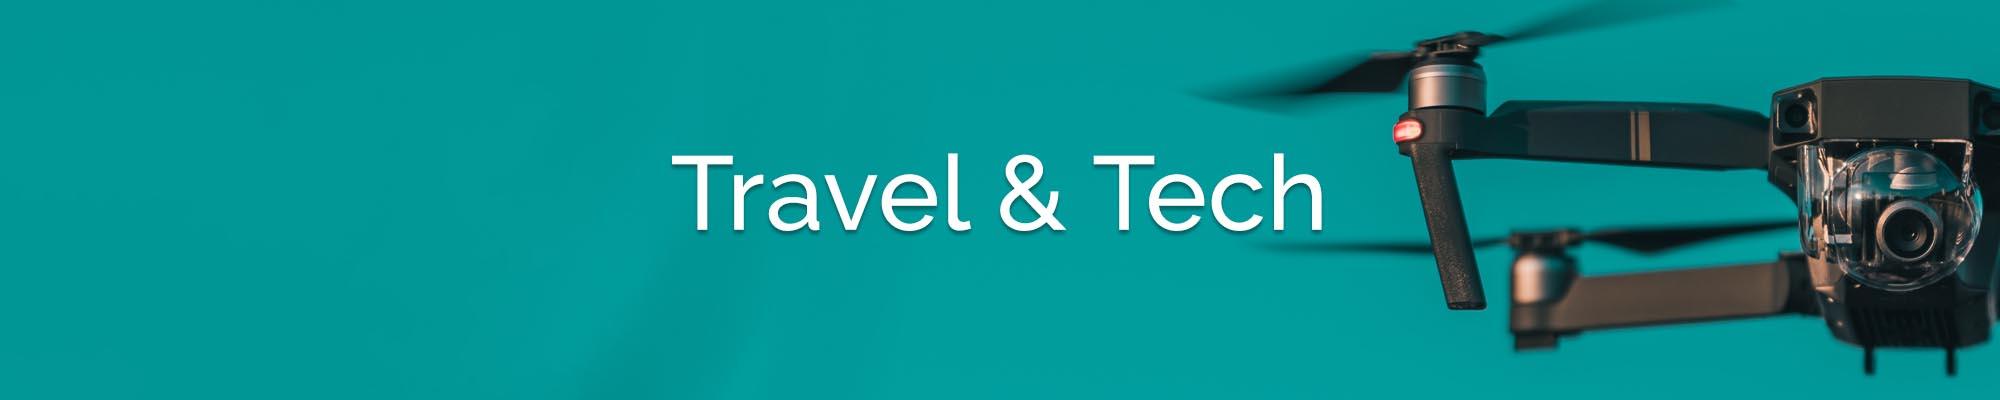 tourism technology